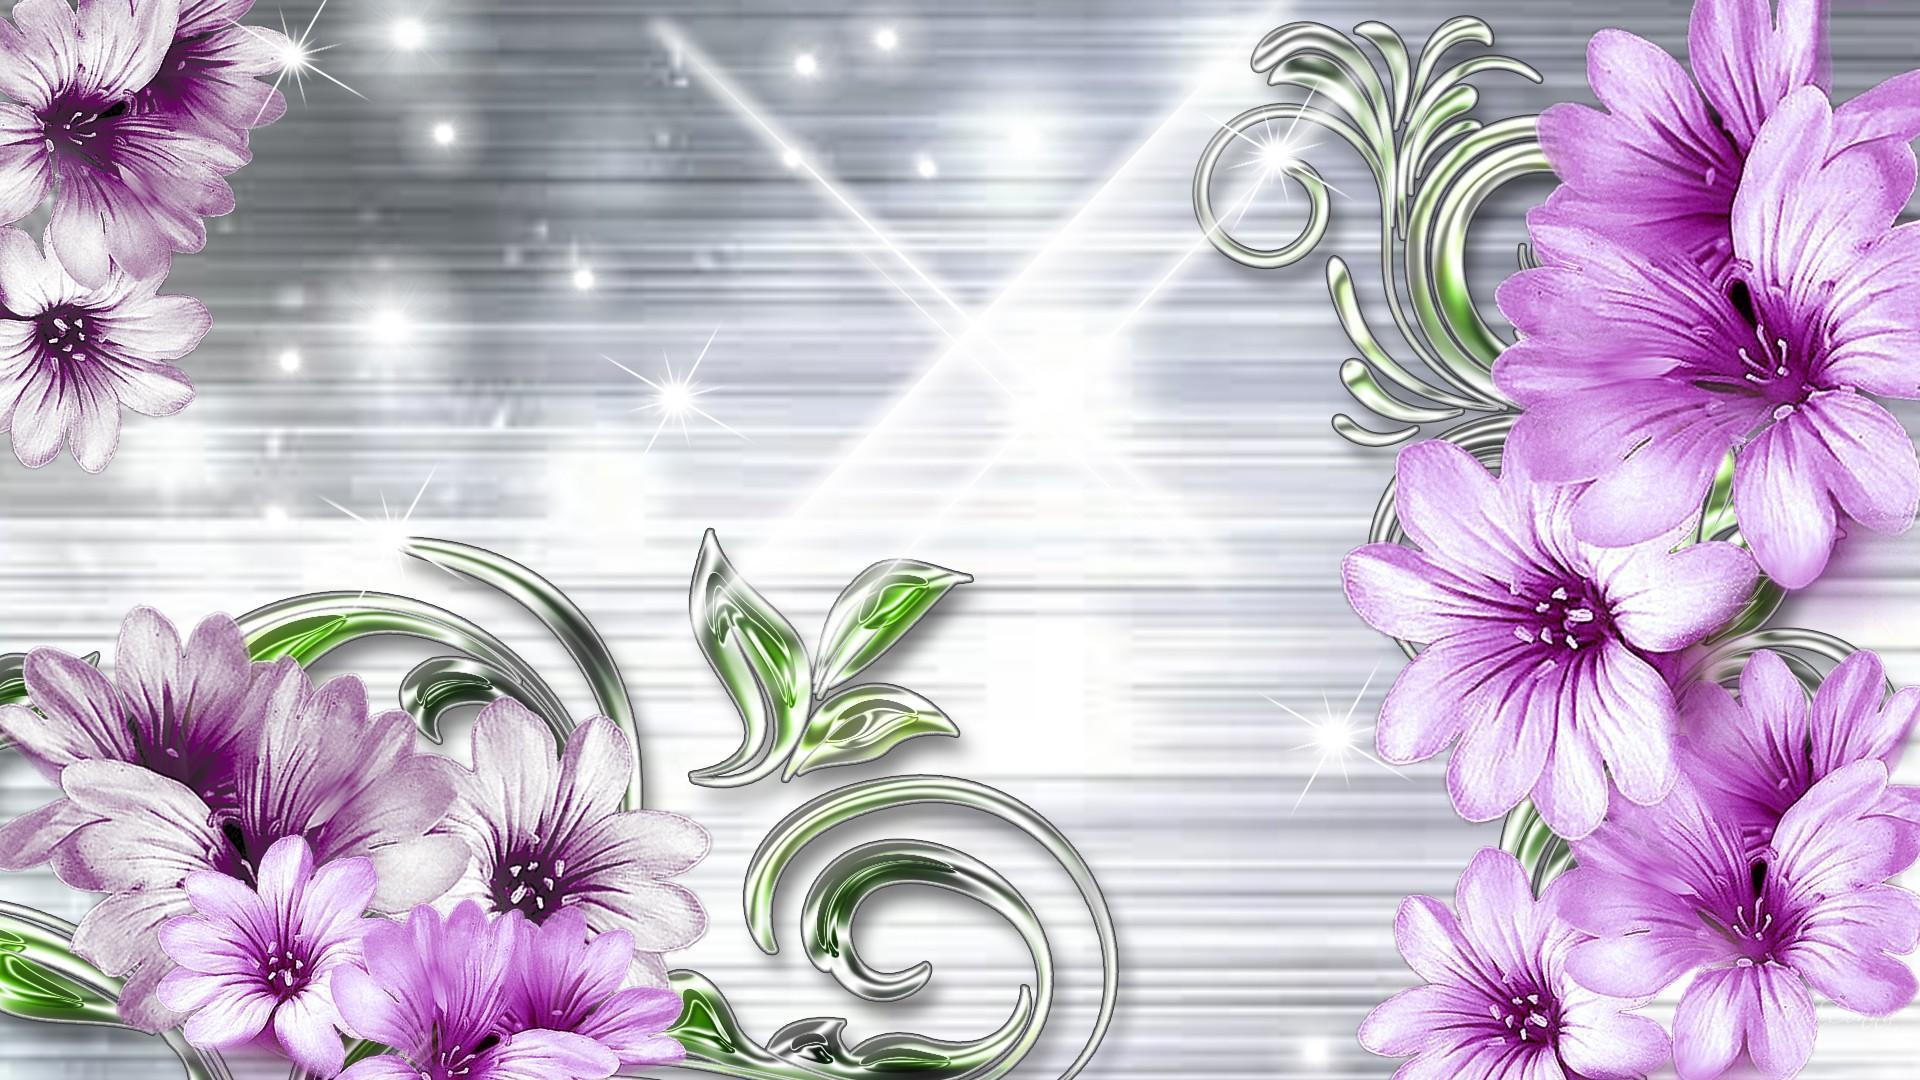 Lavender Color Wallpapers - Wallpaper Cave